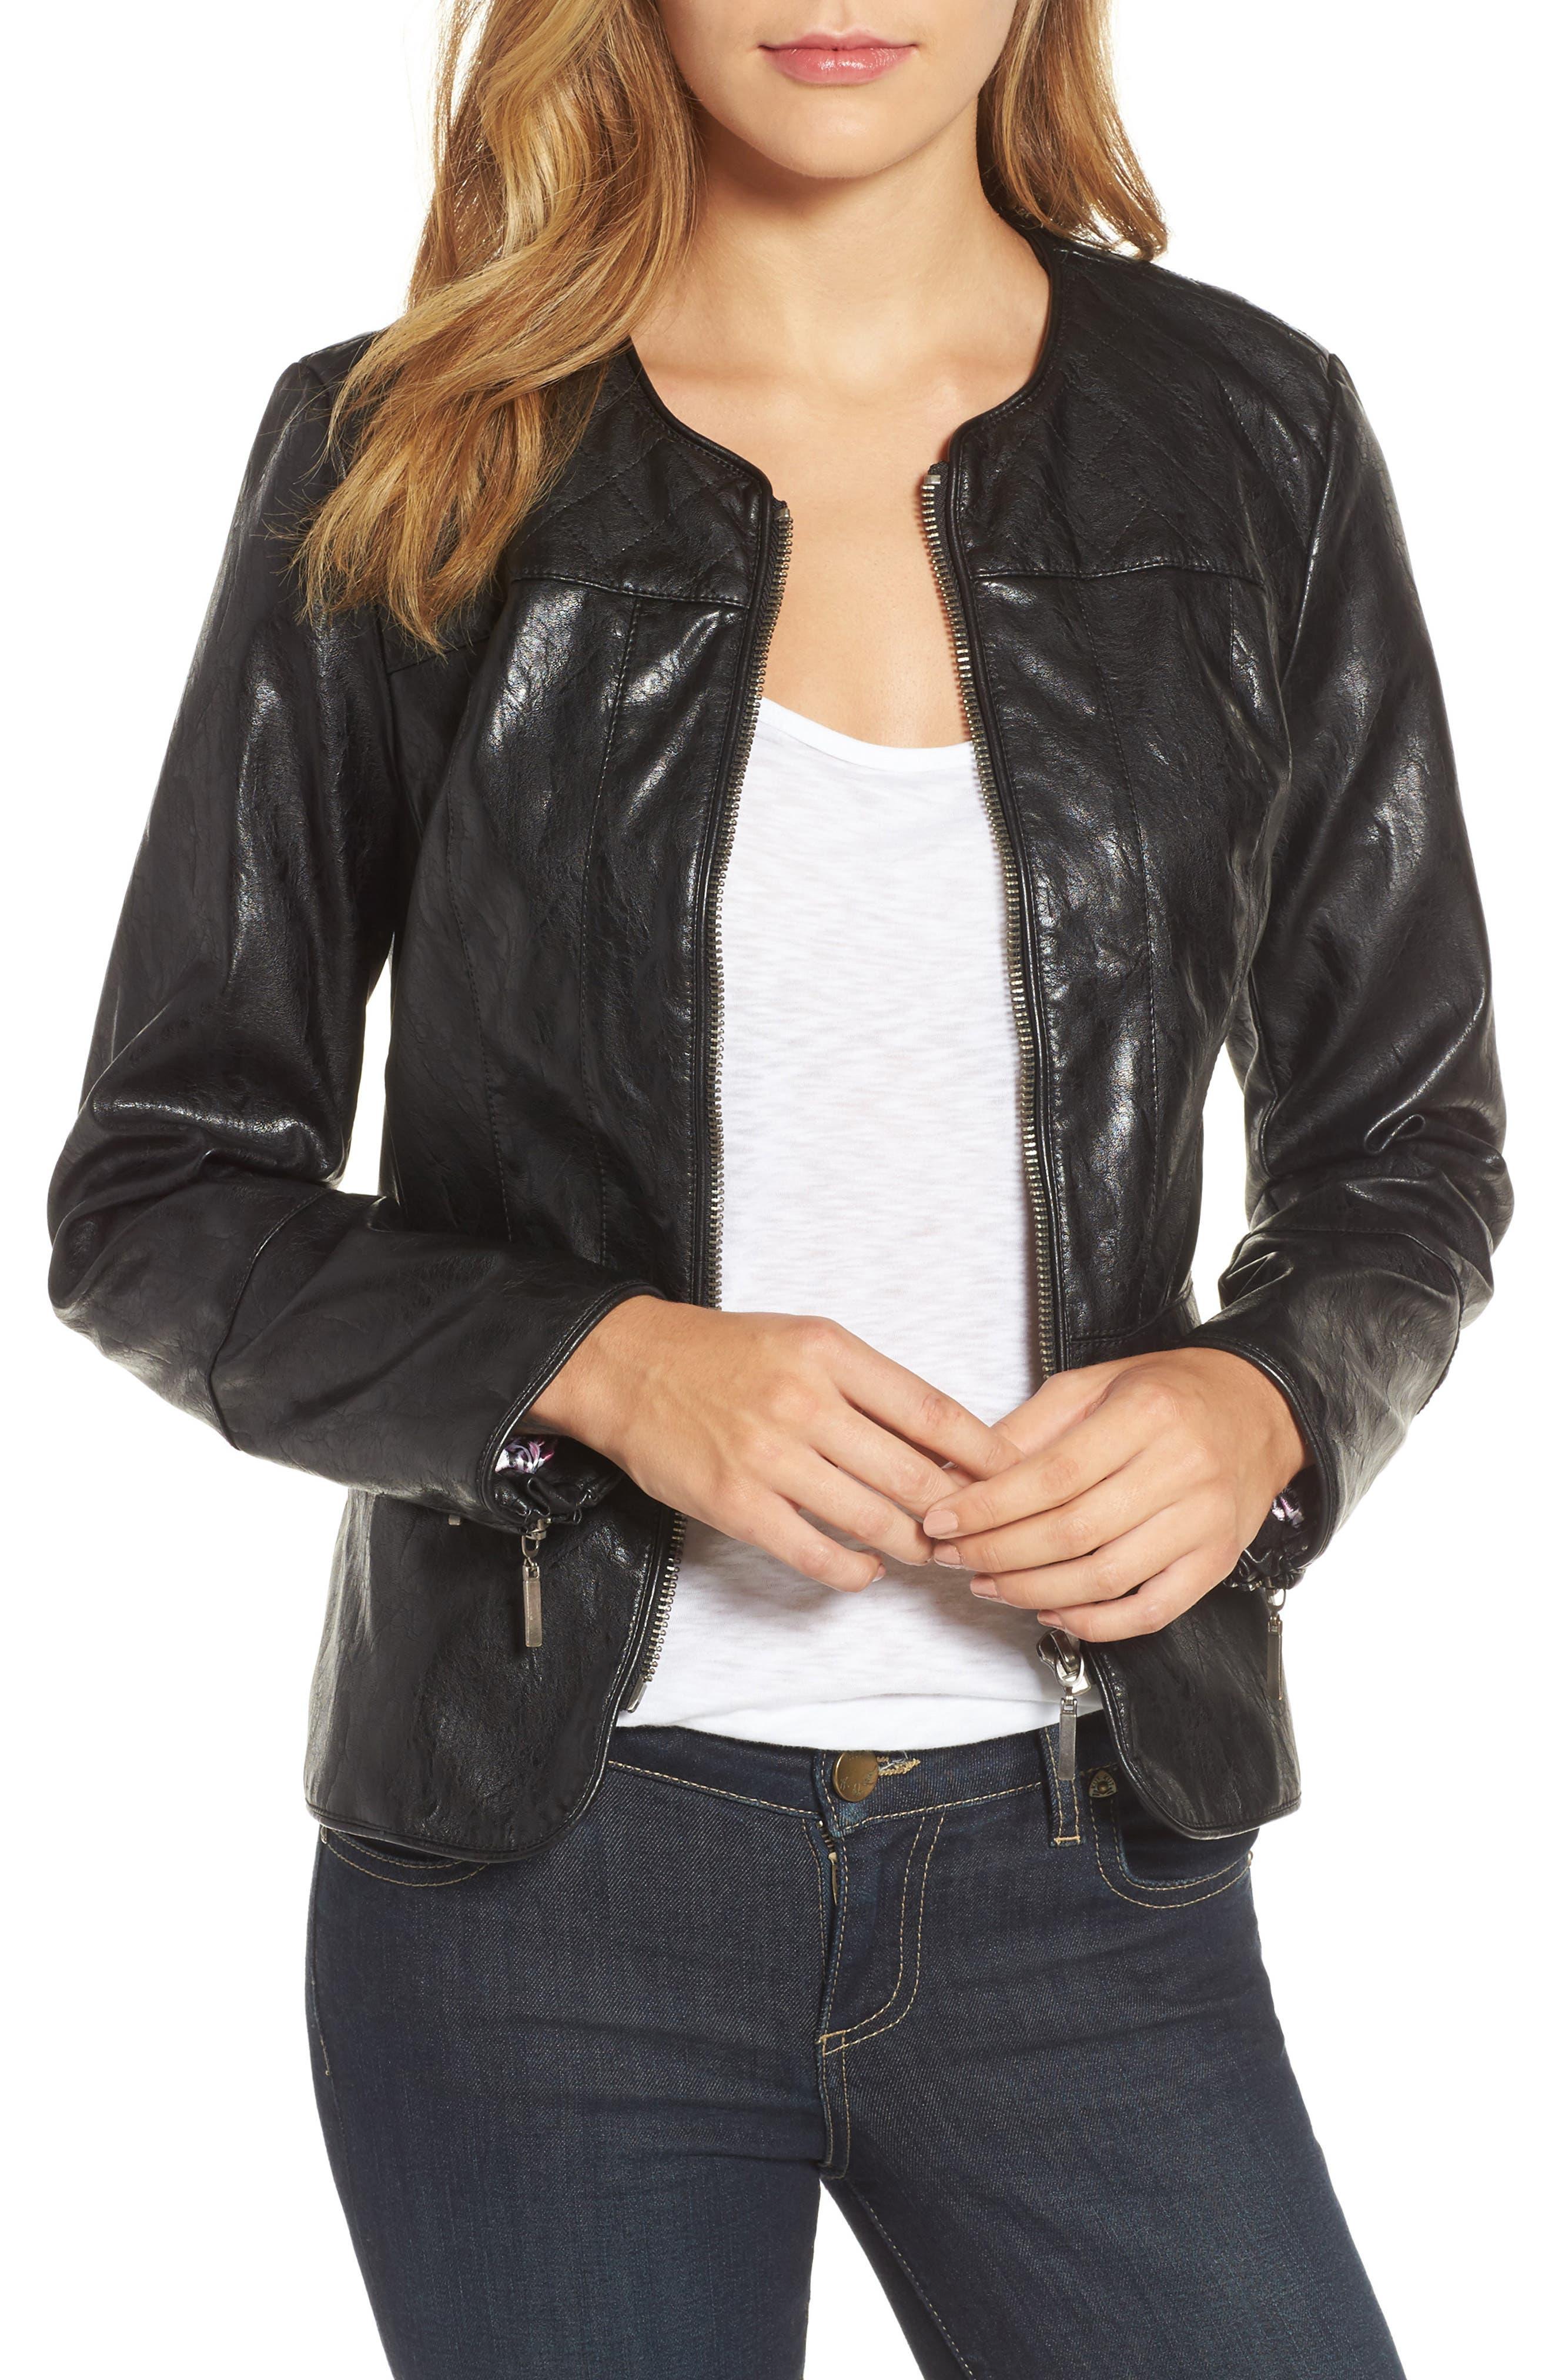 Brandy Motocross Jacket,                         Main,                         color, 002